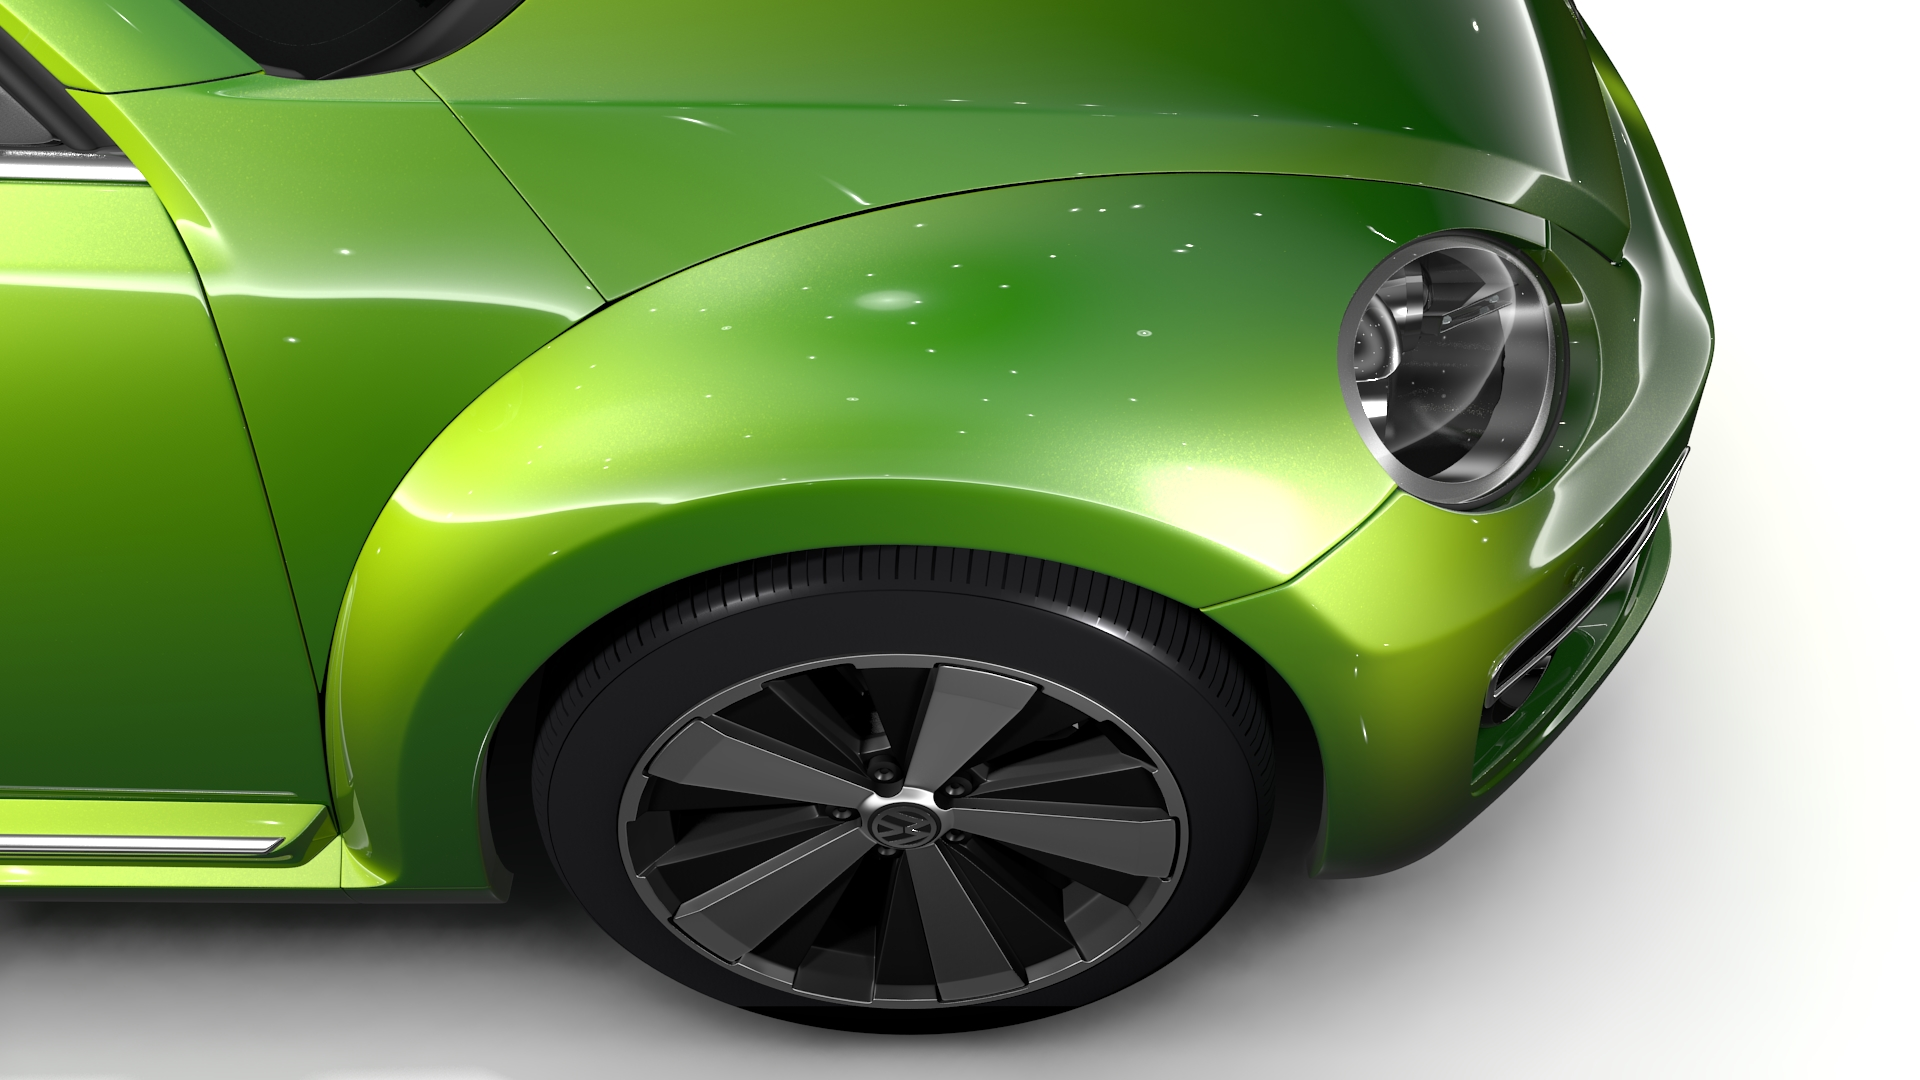 vw beetle 2017 3d model 3ds max fbx c4d lwo ma mb hrc xsi obj 221568